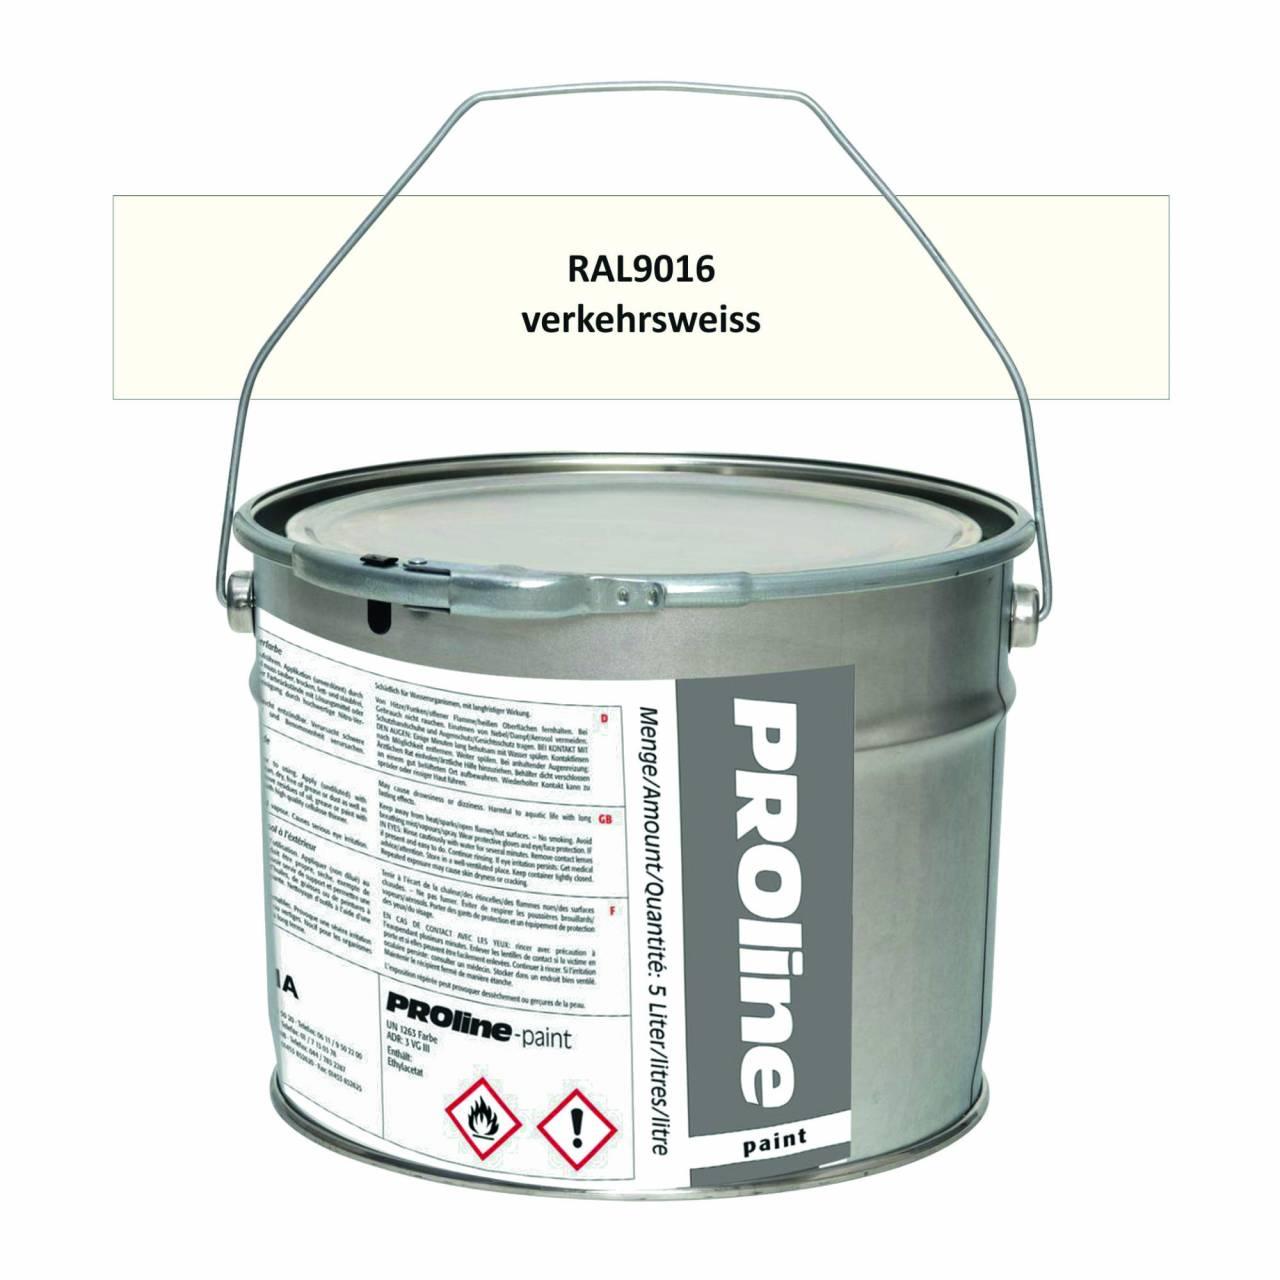 Antirutsch-Markierfarbe 'PROline-paint' WEISS / Eimer a 5,0 Liter